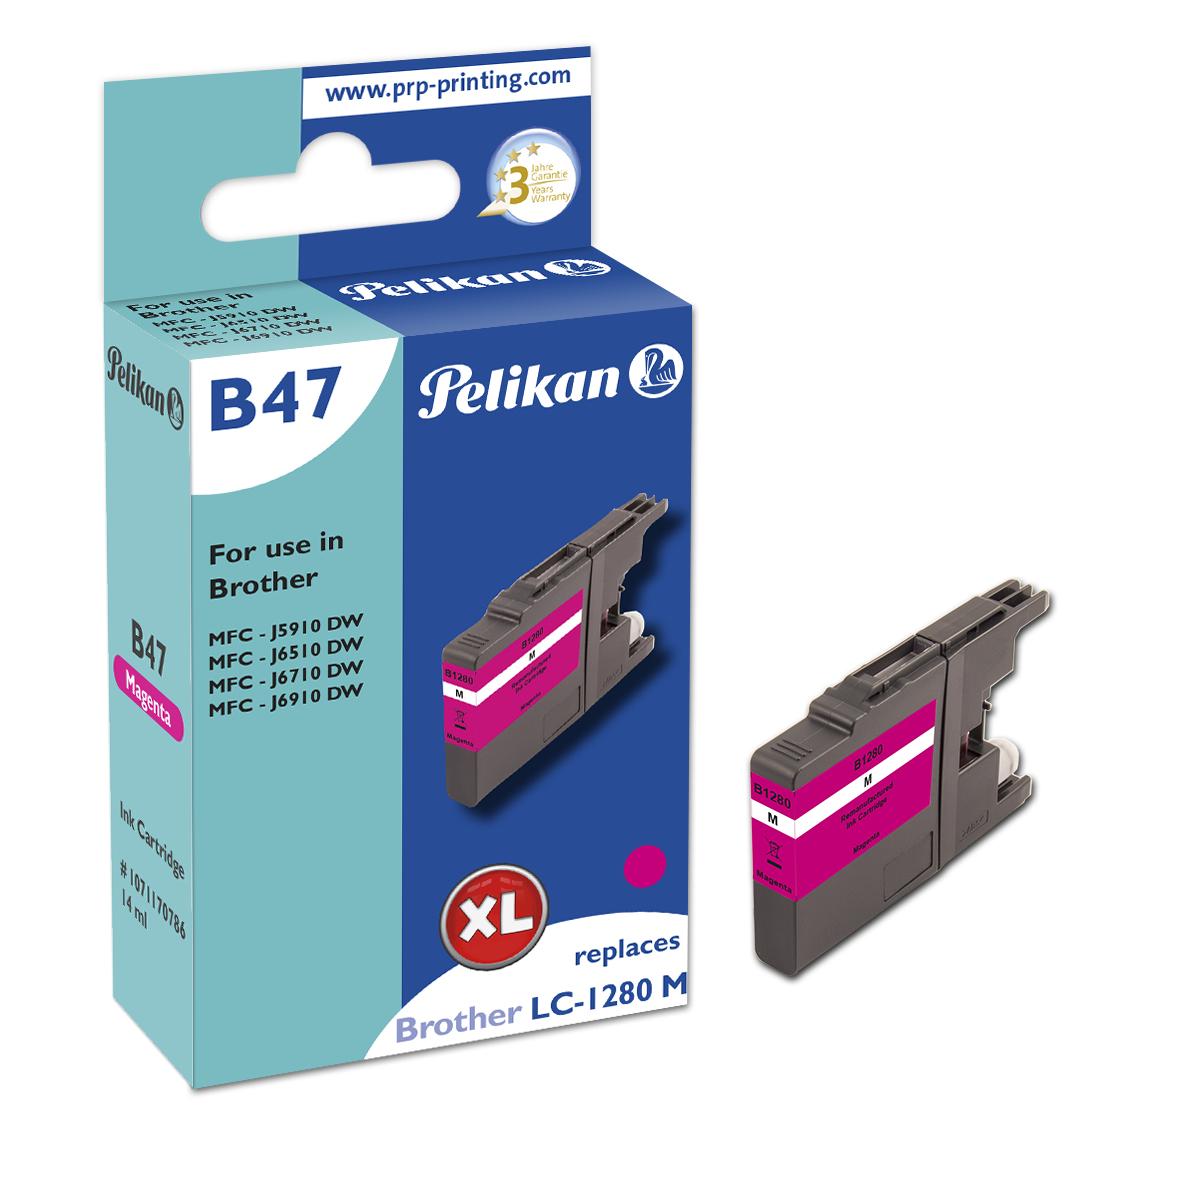 Pelikan B47 Magenta - Box - Tintenpatrone Wiederaufbereitet, Kompatibel - Magenta